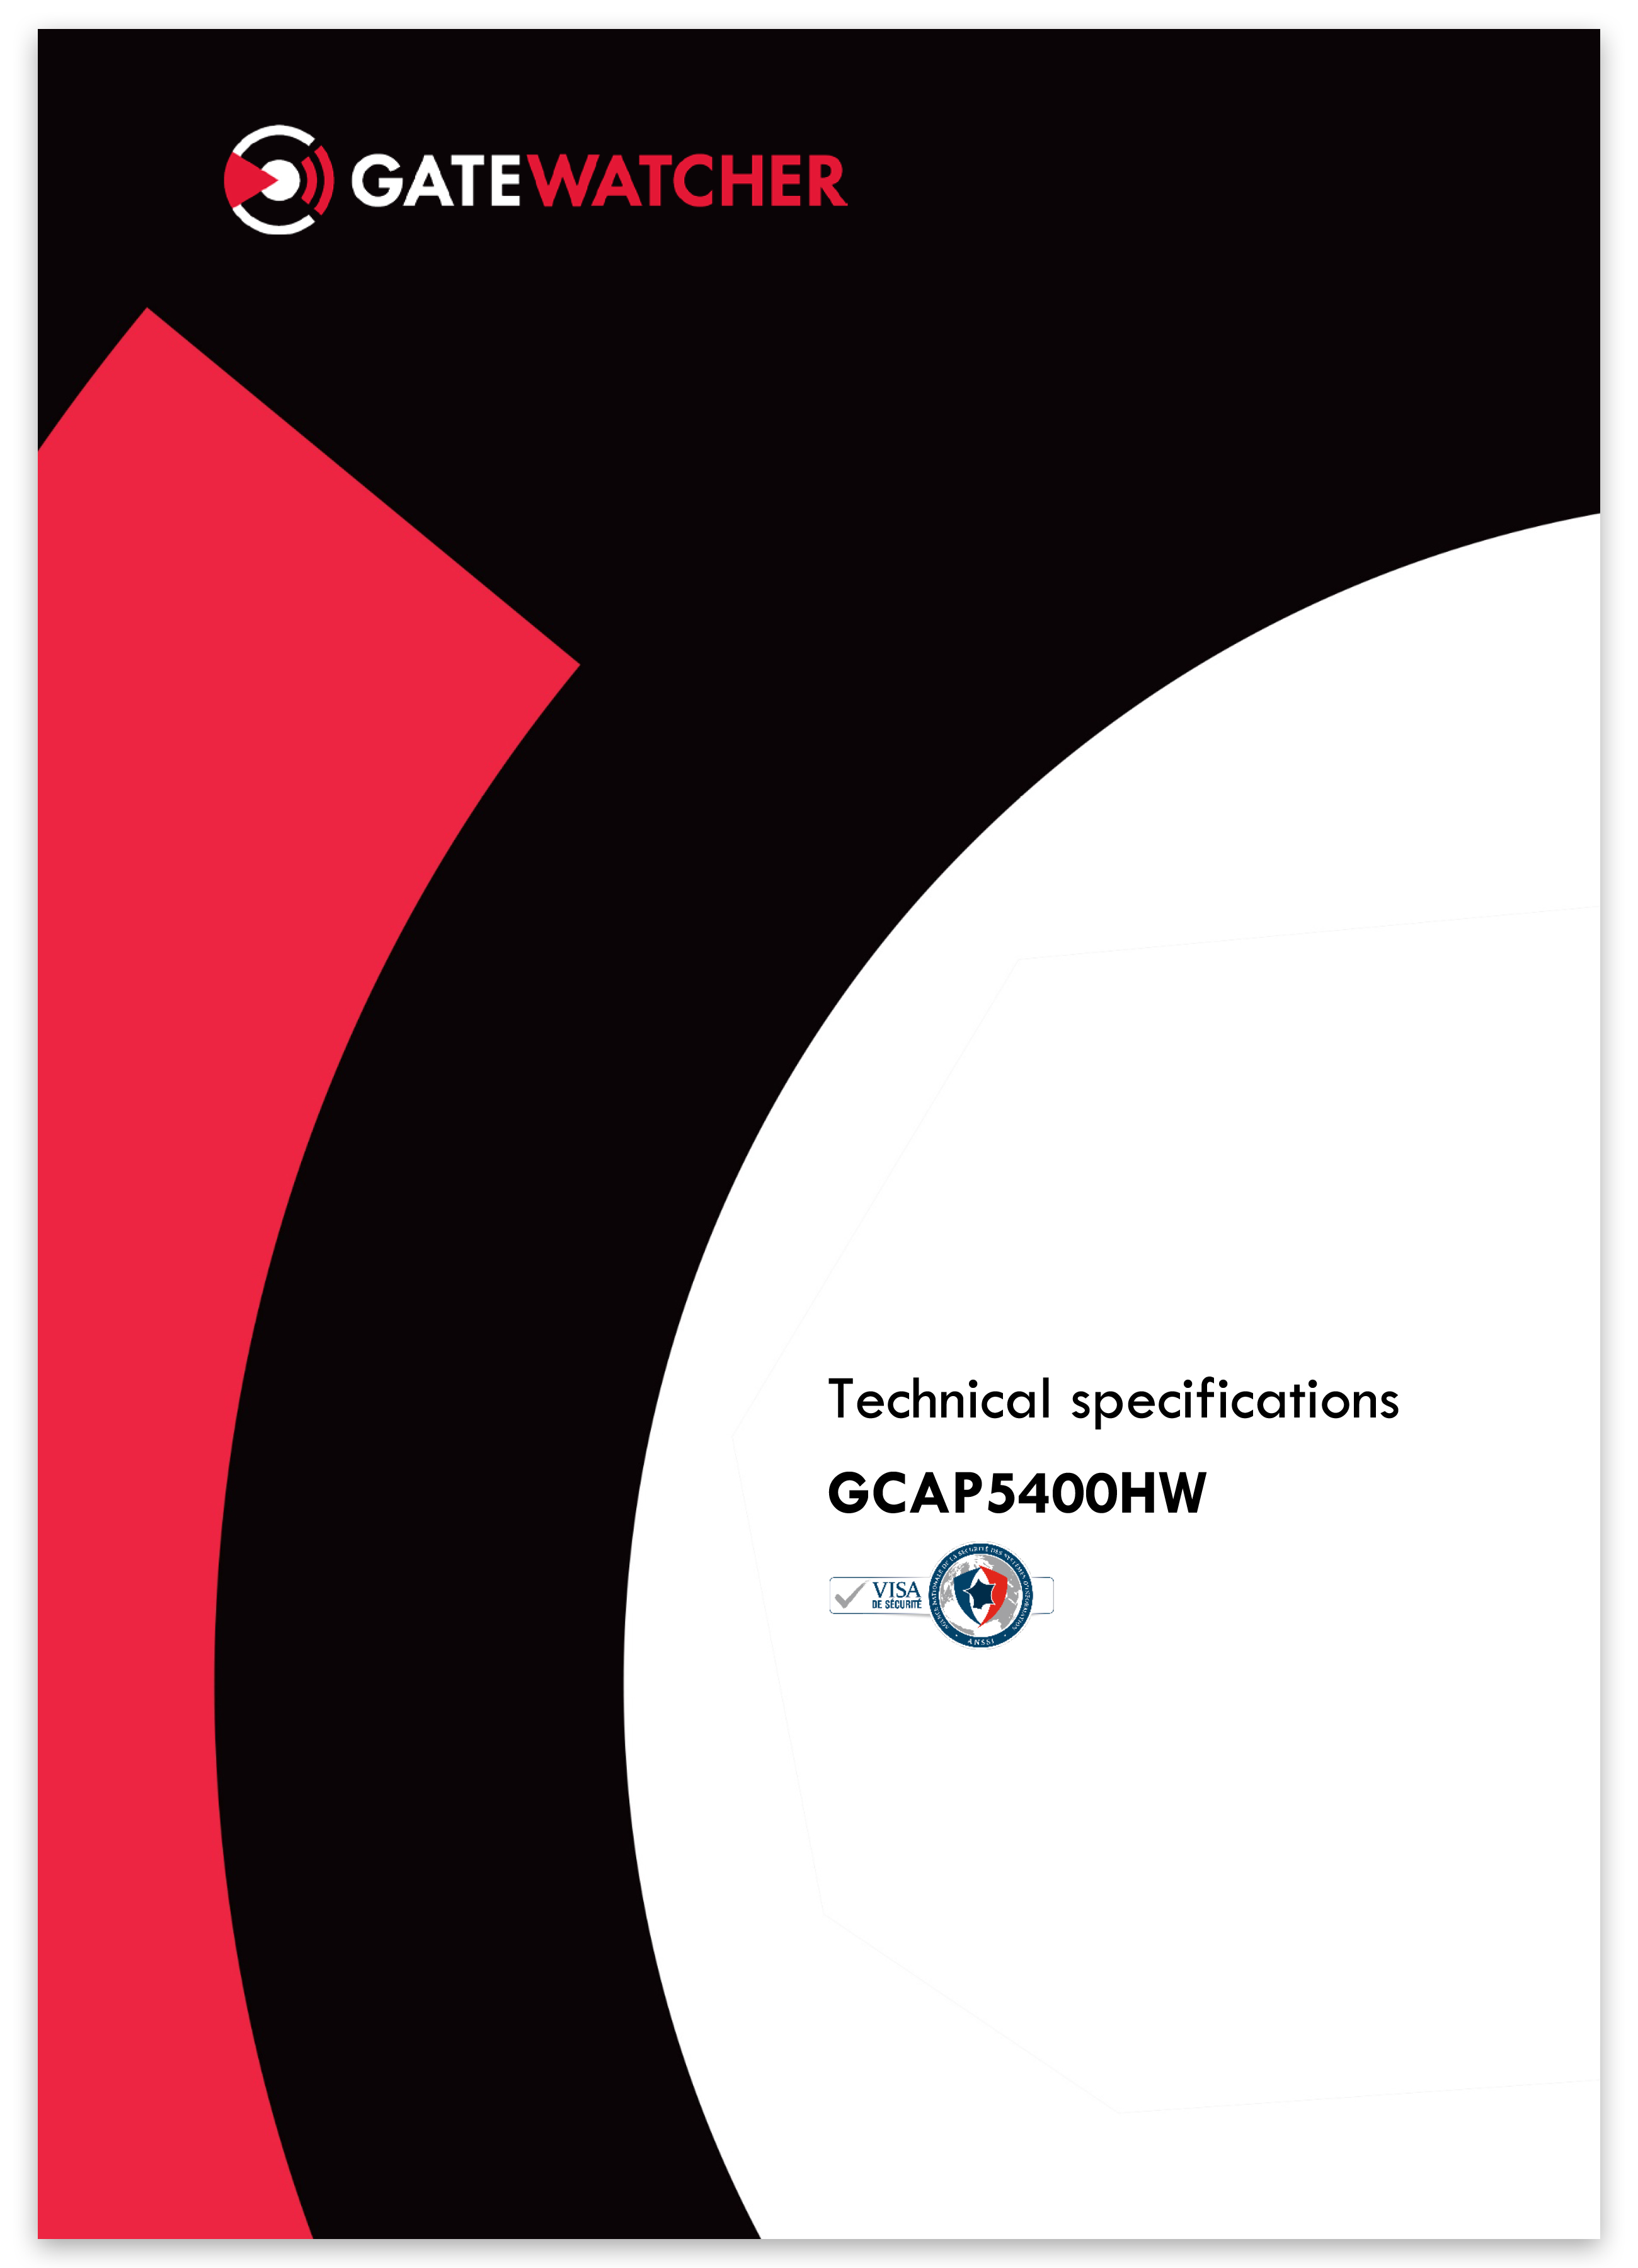 Gatewatcher GCAP5400HW EN